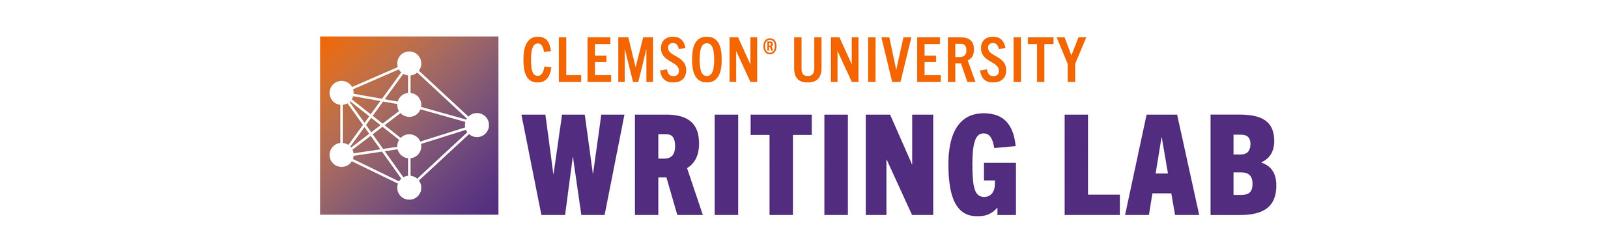 Clemson University Writing Lab Logo